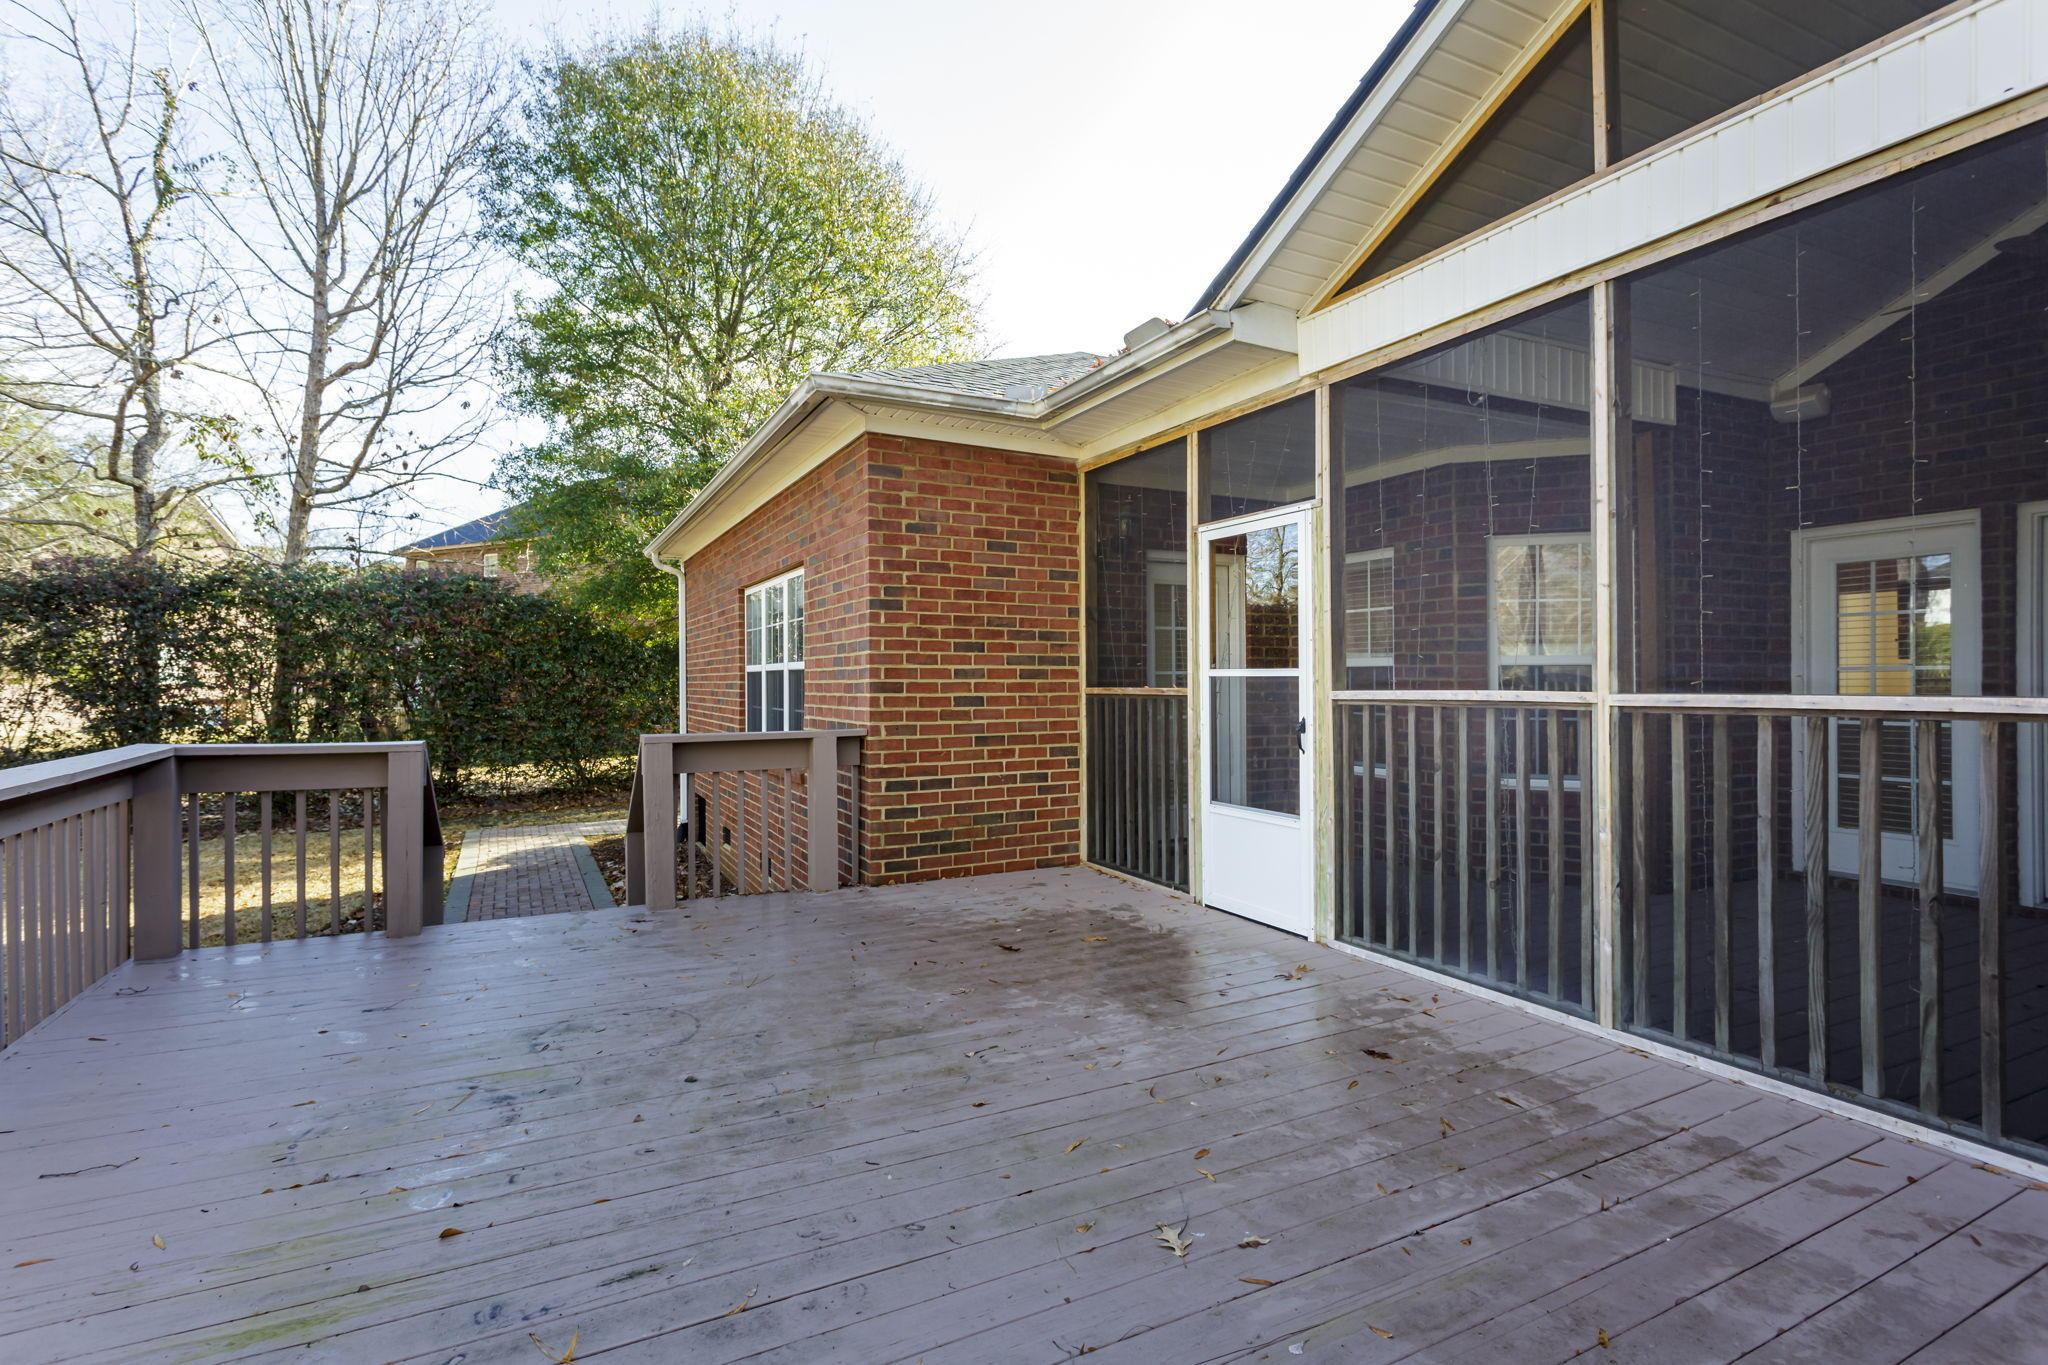 Crowfield Plantation Homes For Sale - 111 Thames, Goose Creek, SC - 26